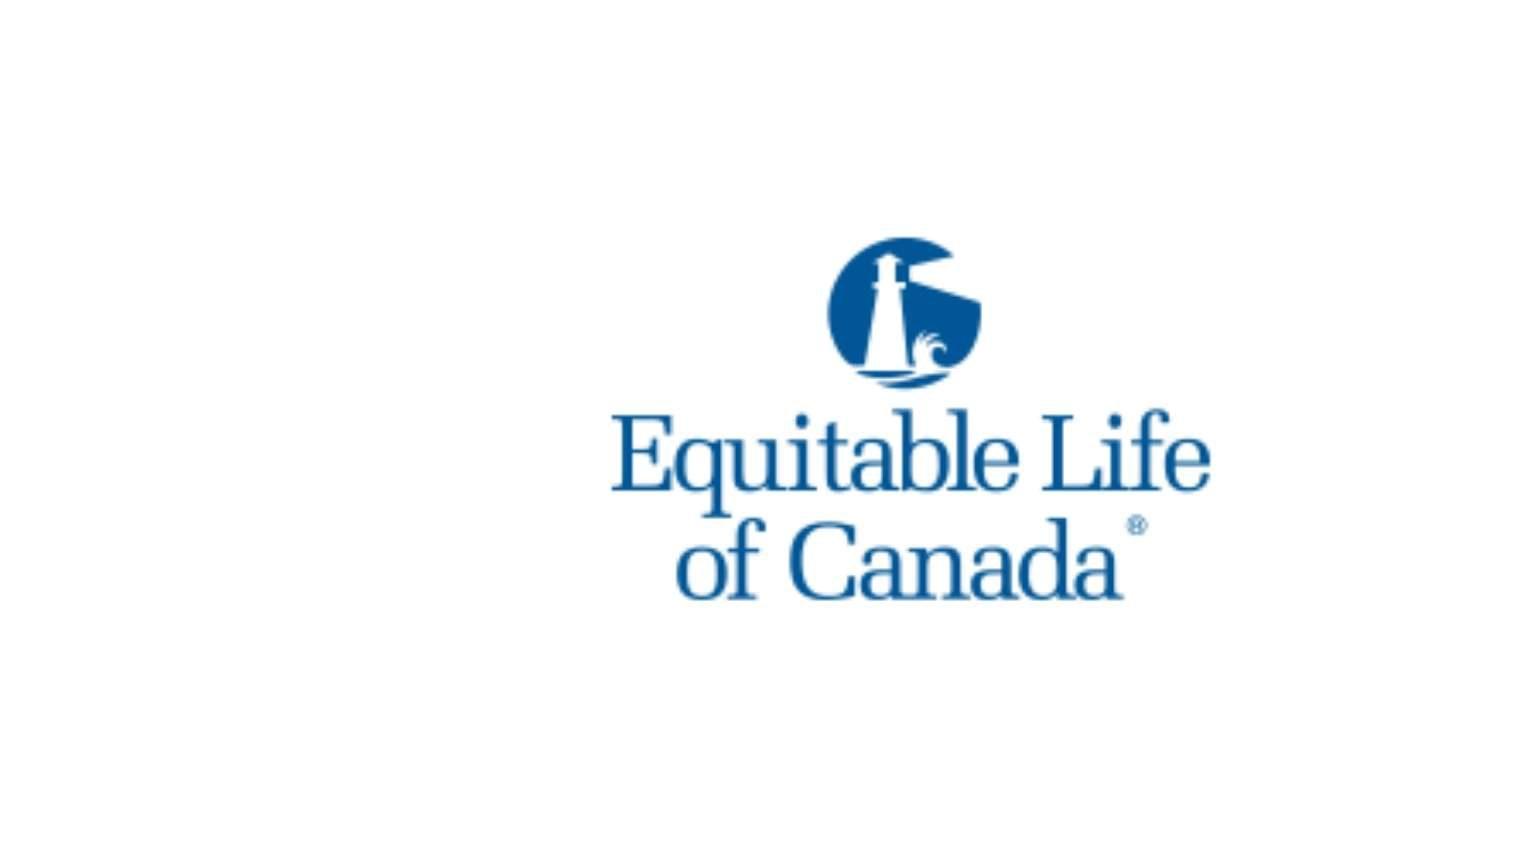 Equitable life insurance